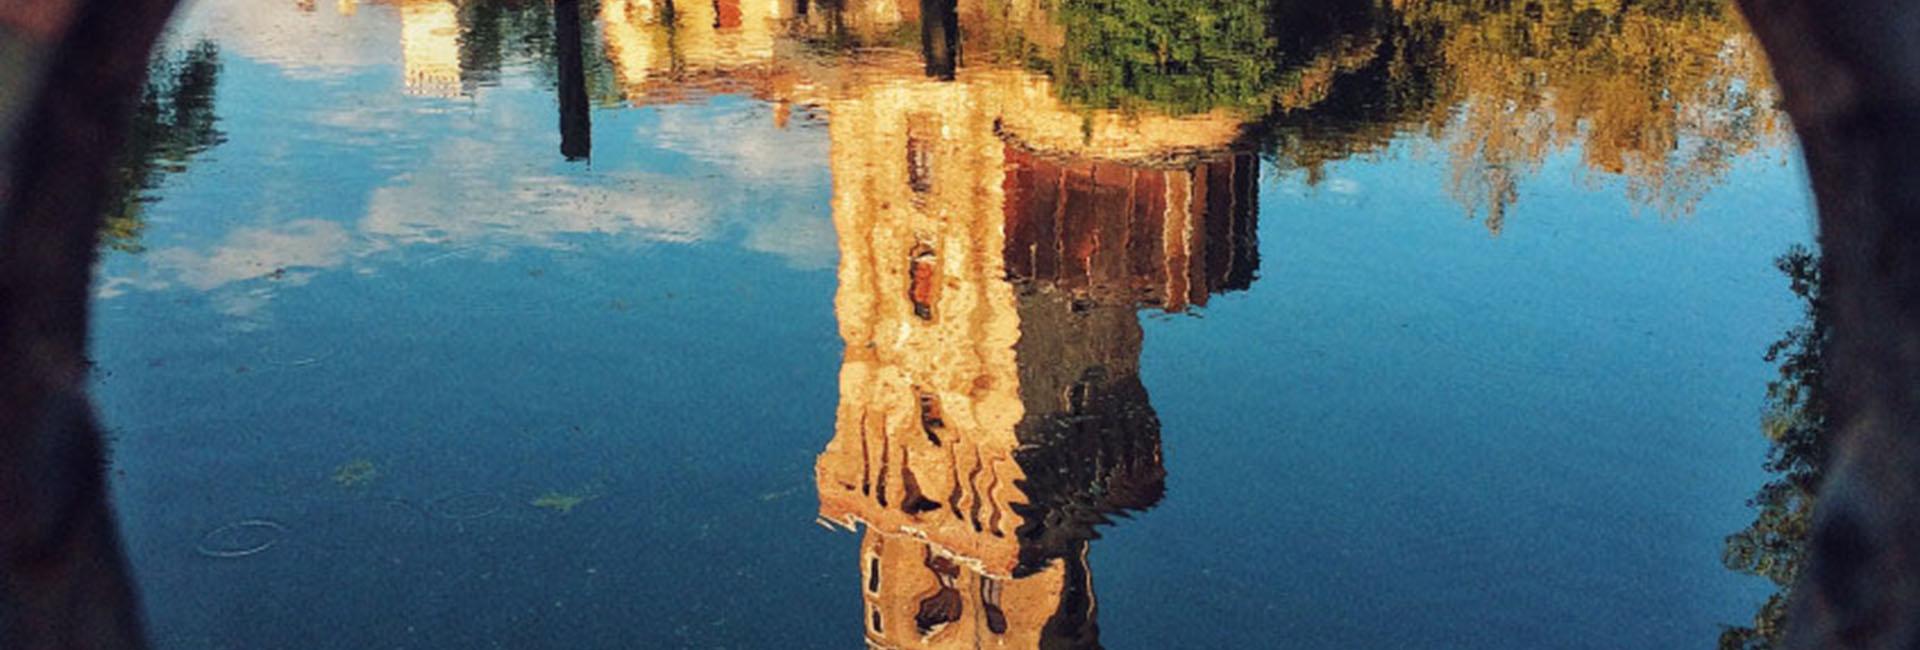 Padova Travel Vie d'acqua ©Emiliano Poci